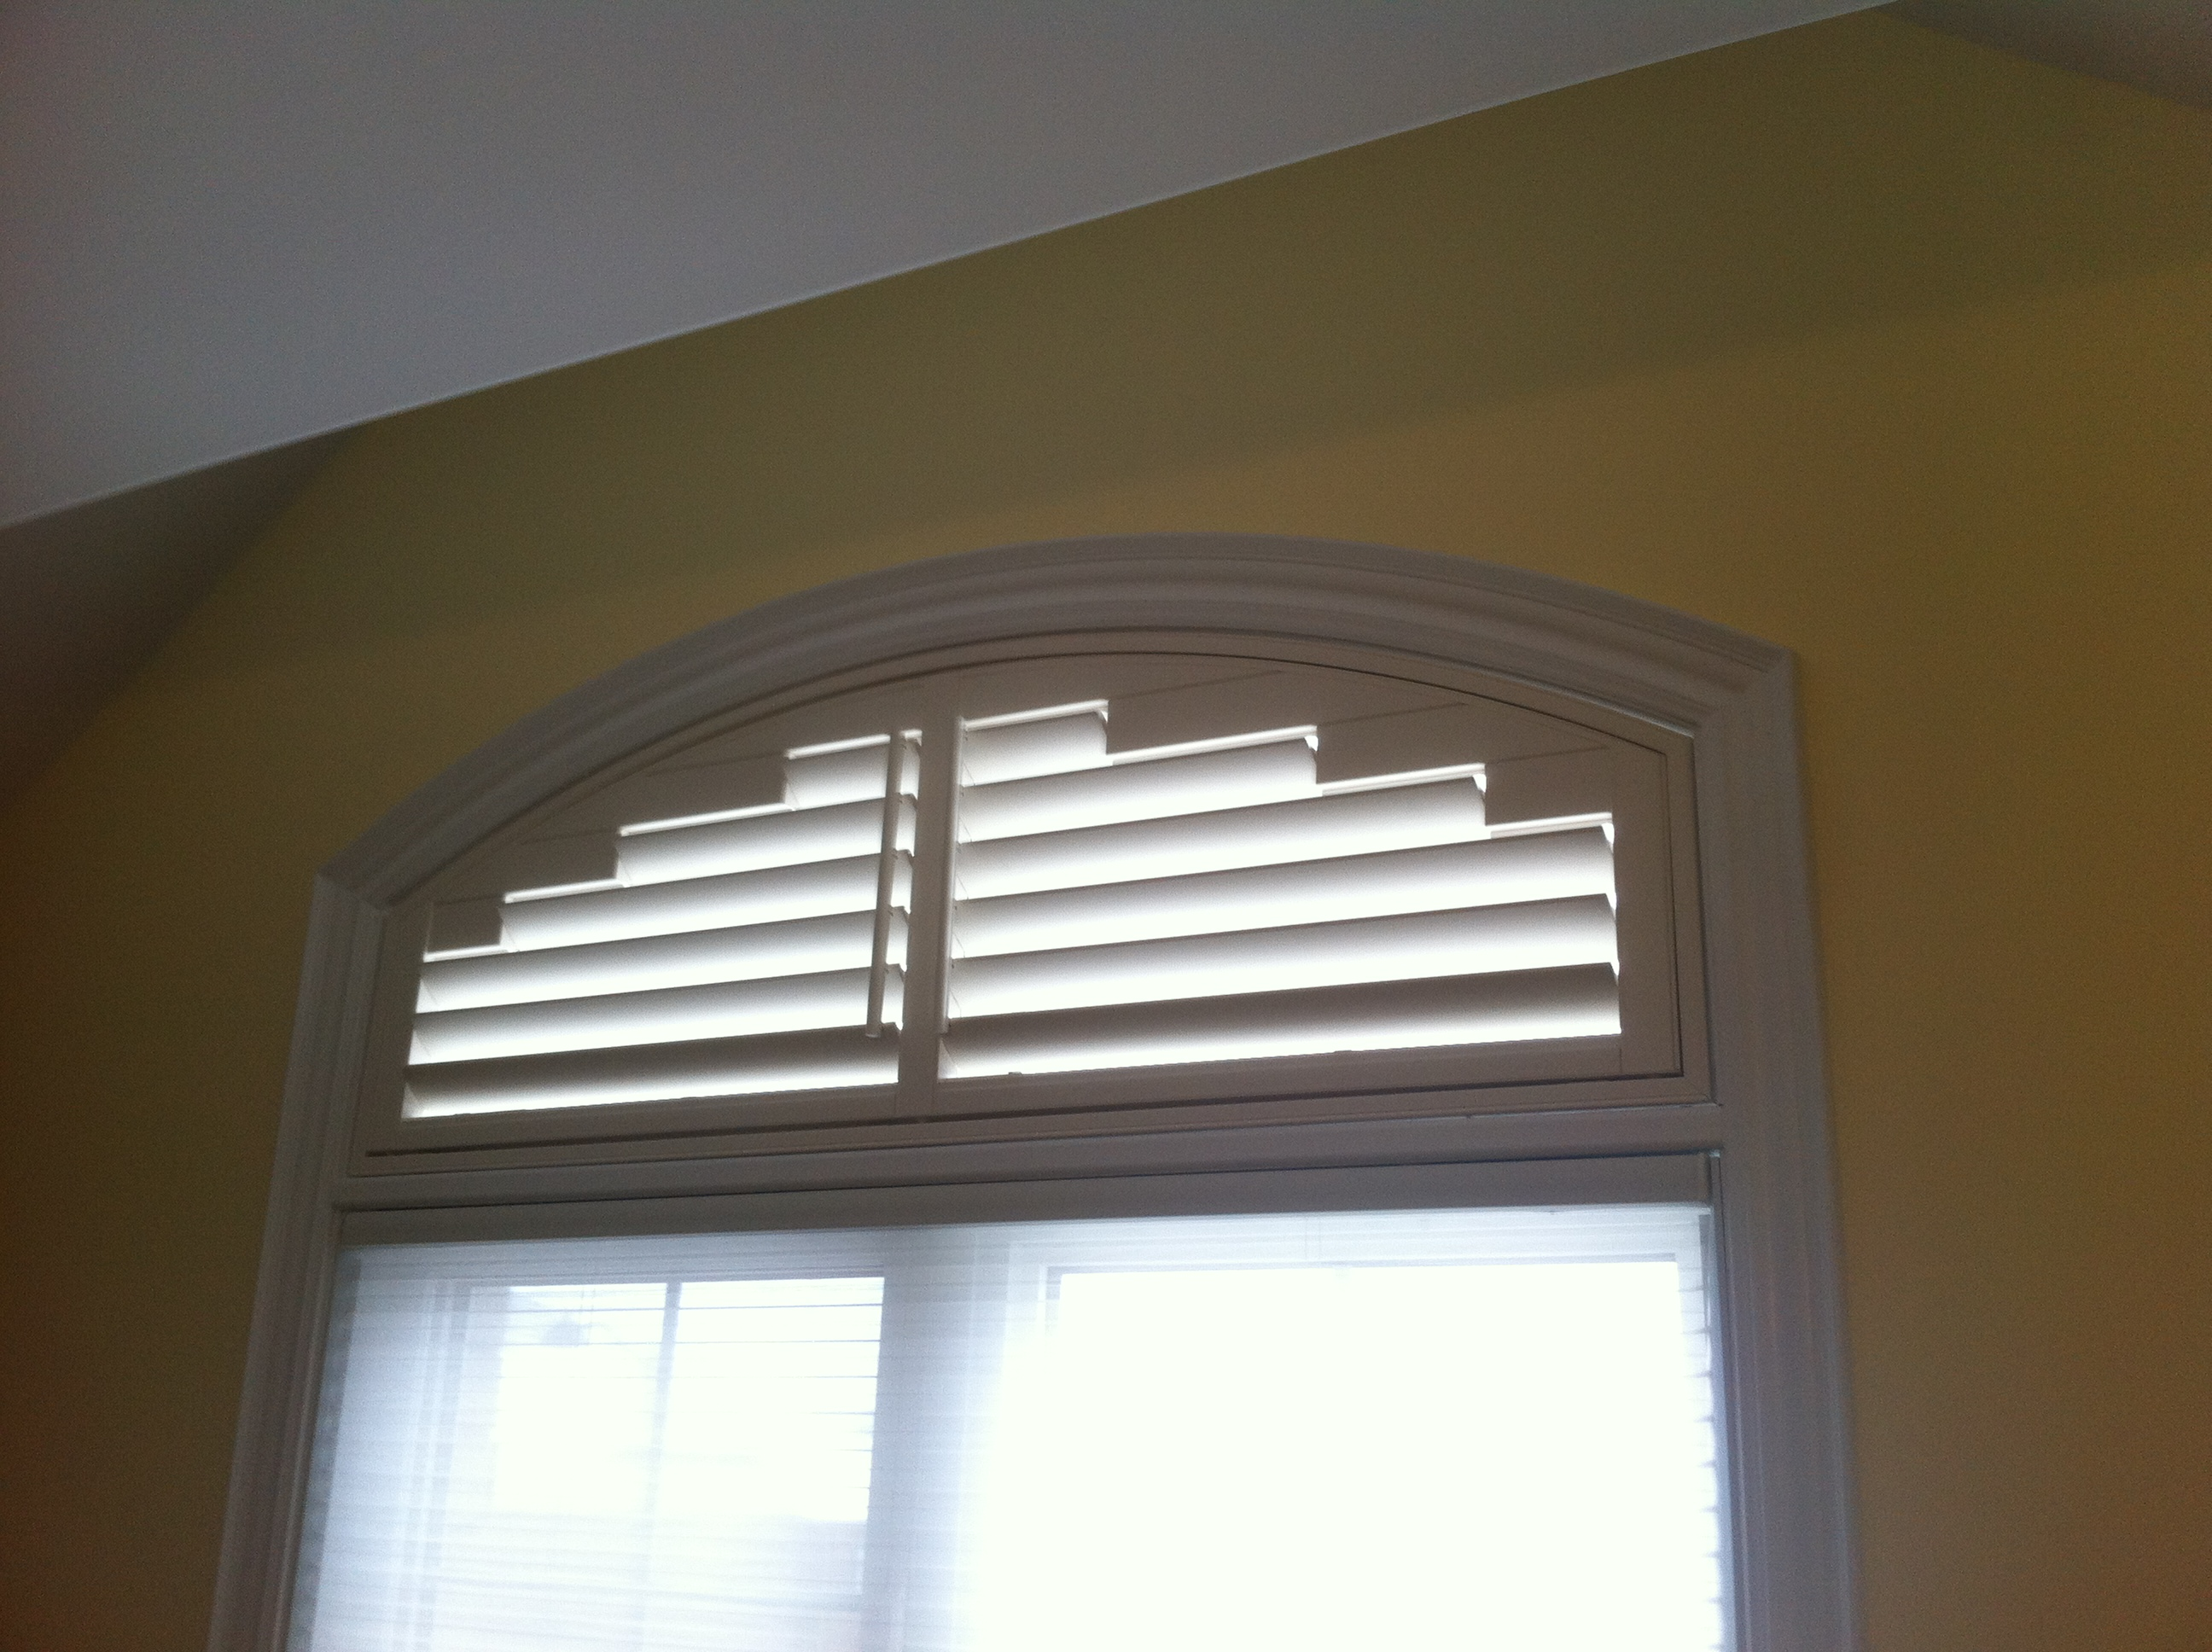 Arch window shade fabulous loweus arch window shades